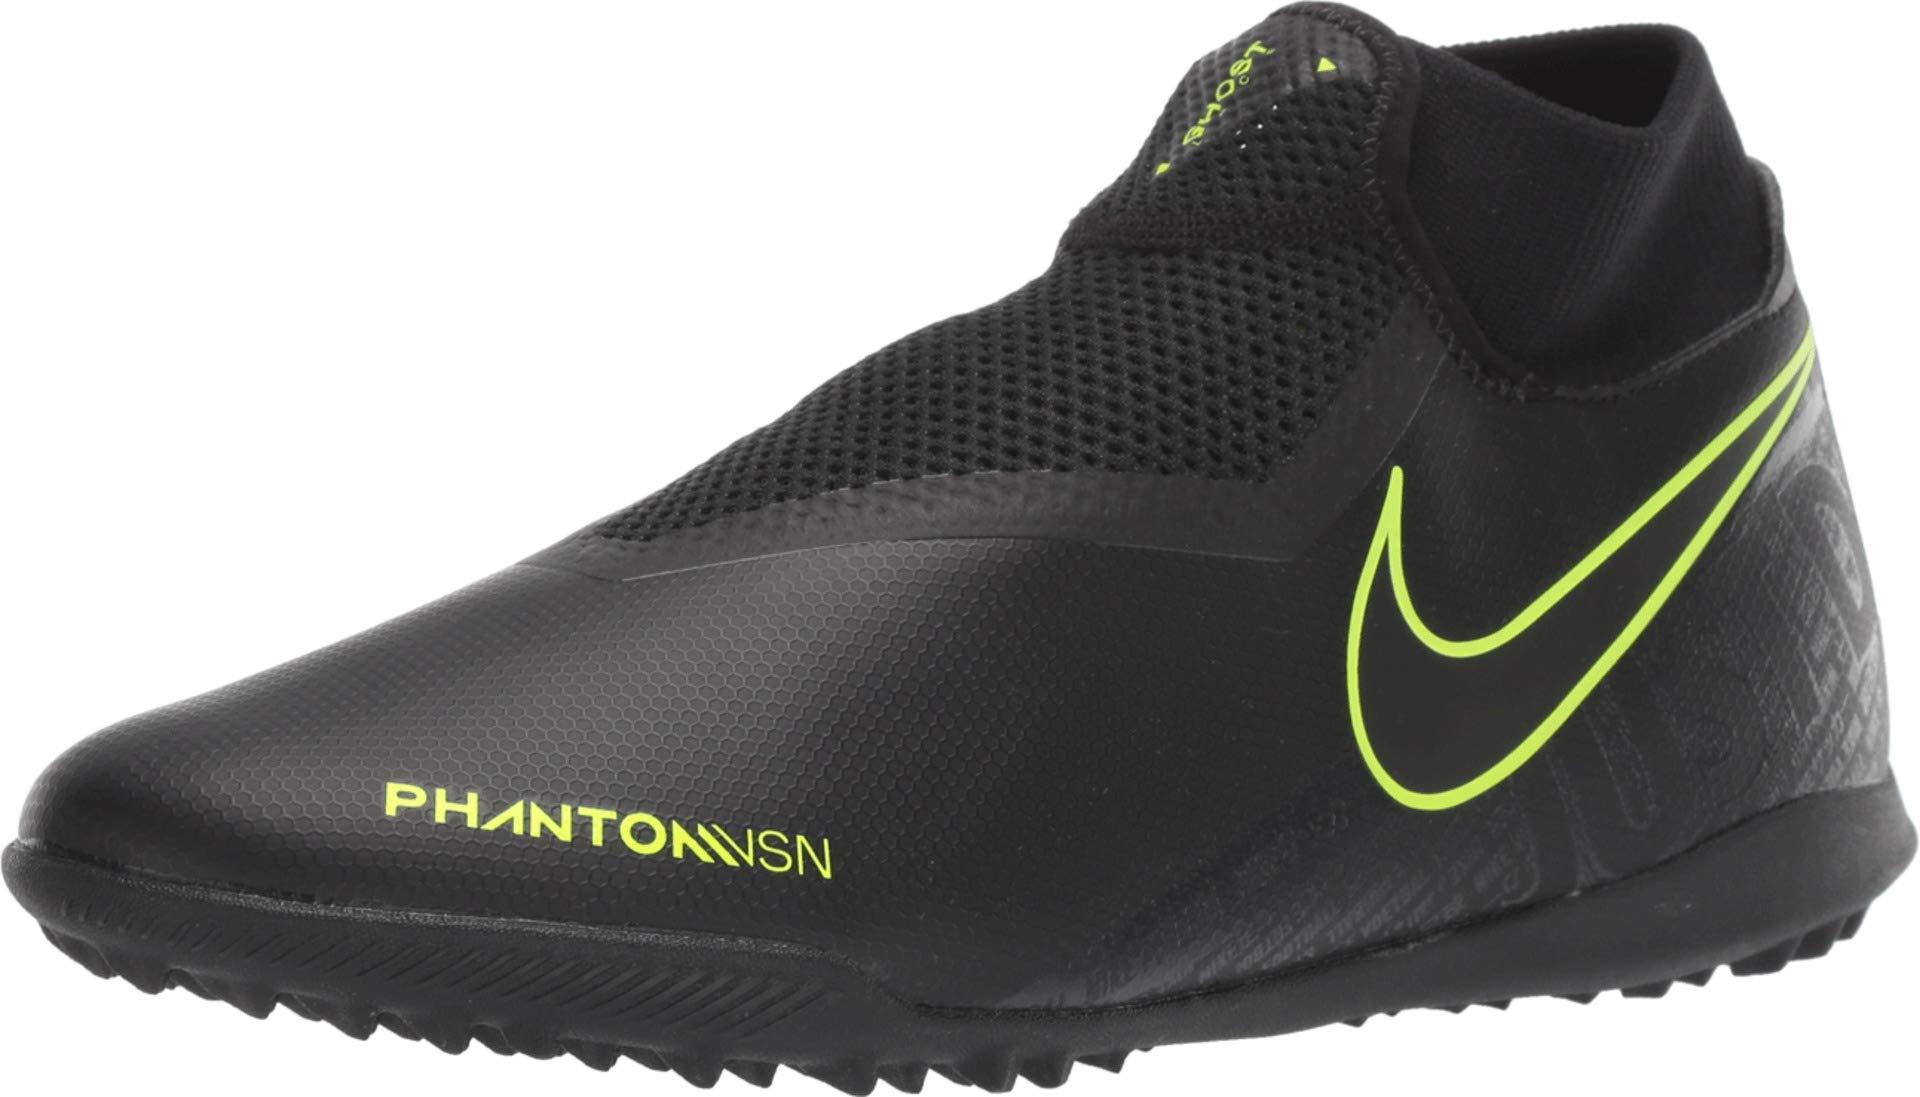 Nike Phantom Vision Academy DF TF - Black-Volt 10.5 by Nike